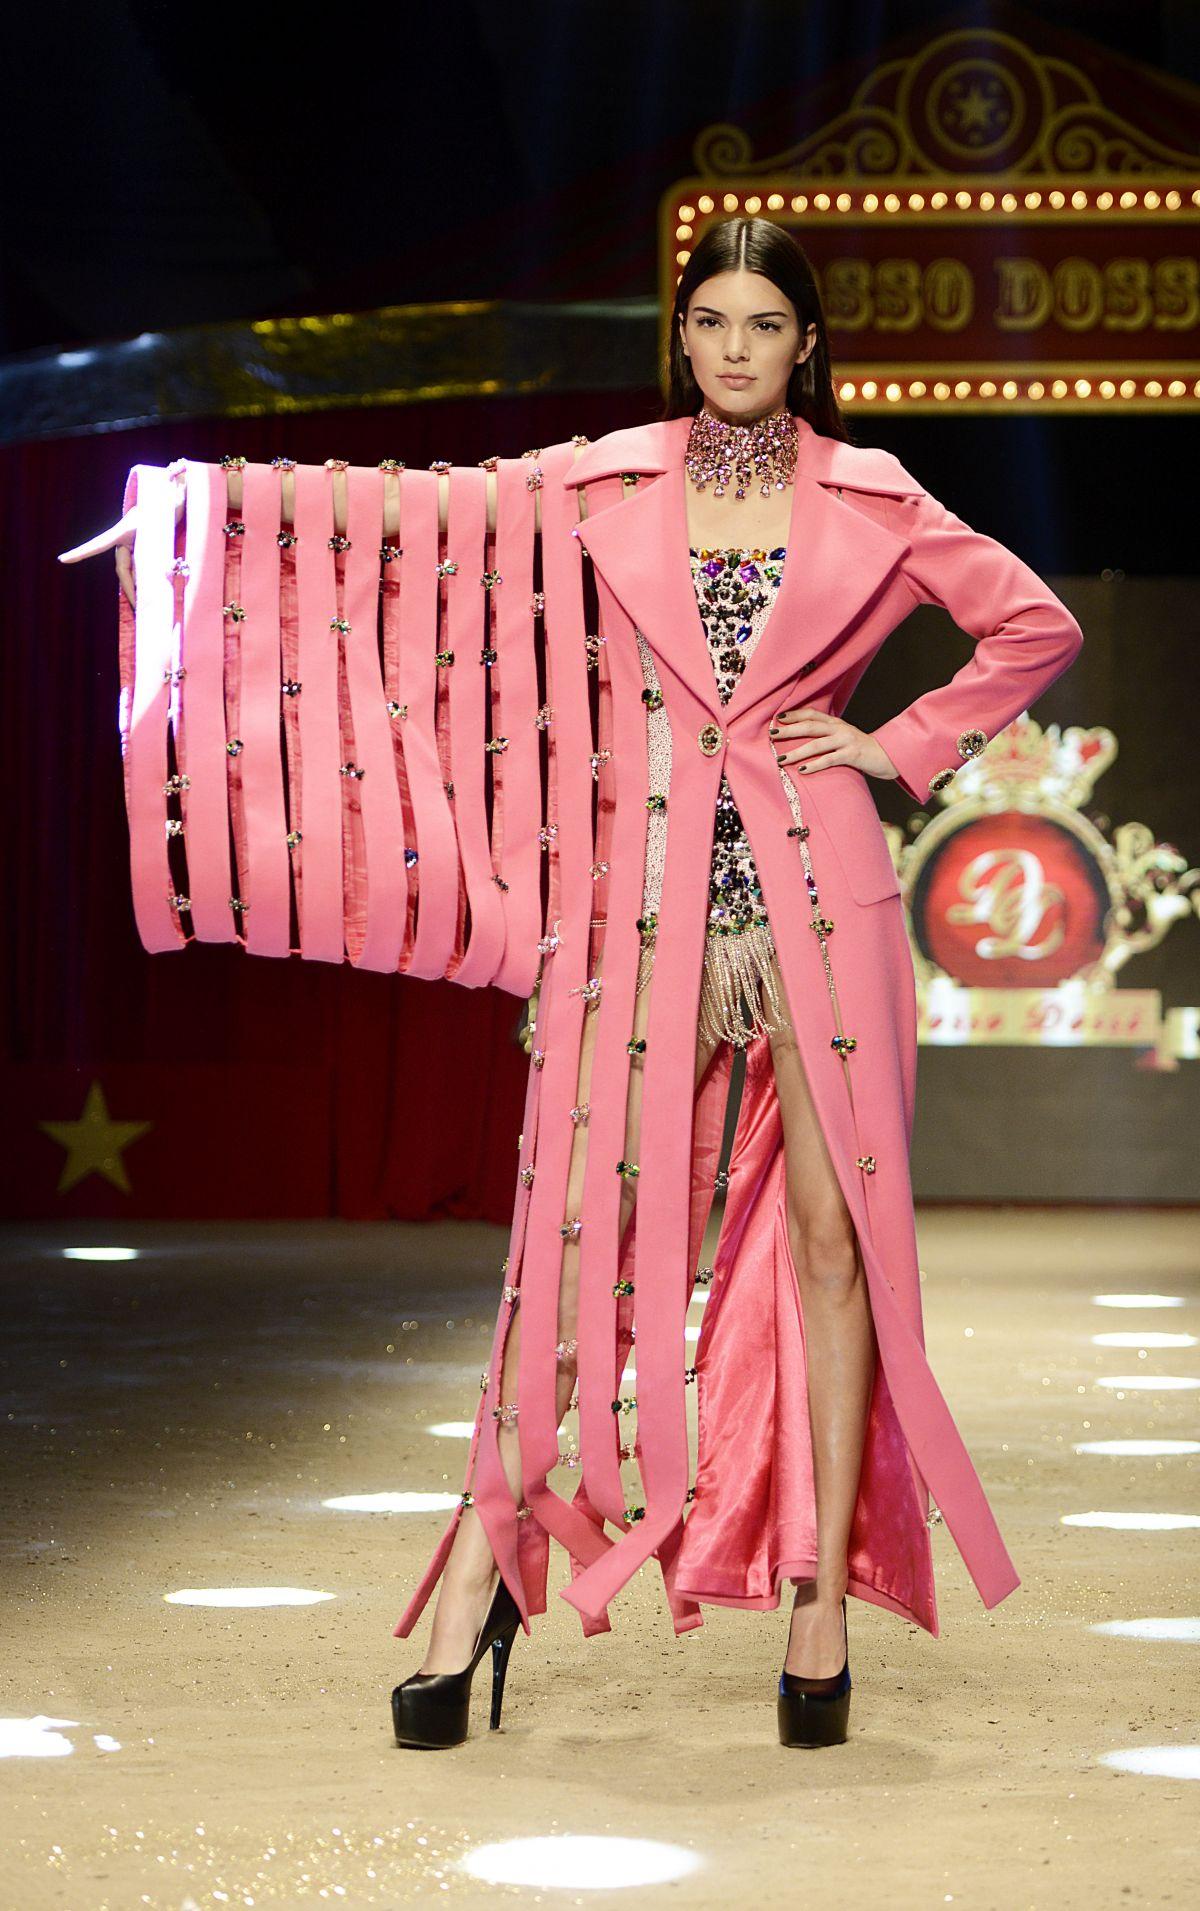 Dosso dossi fashion show antalya 56